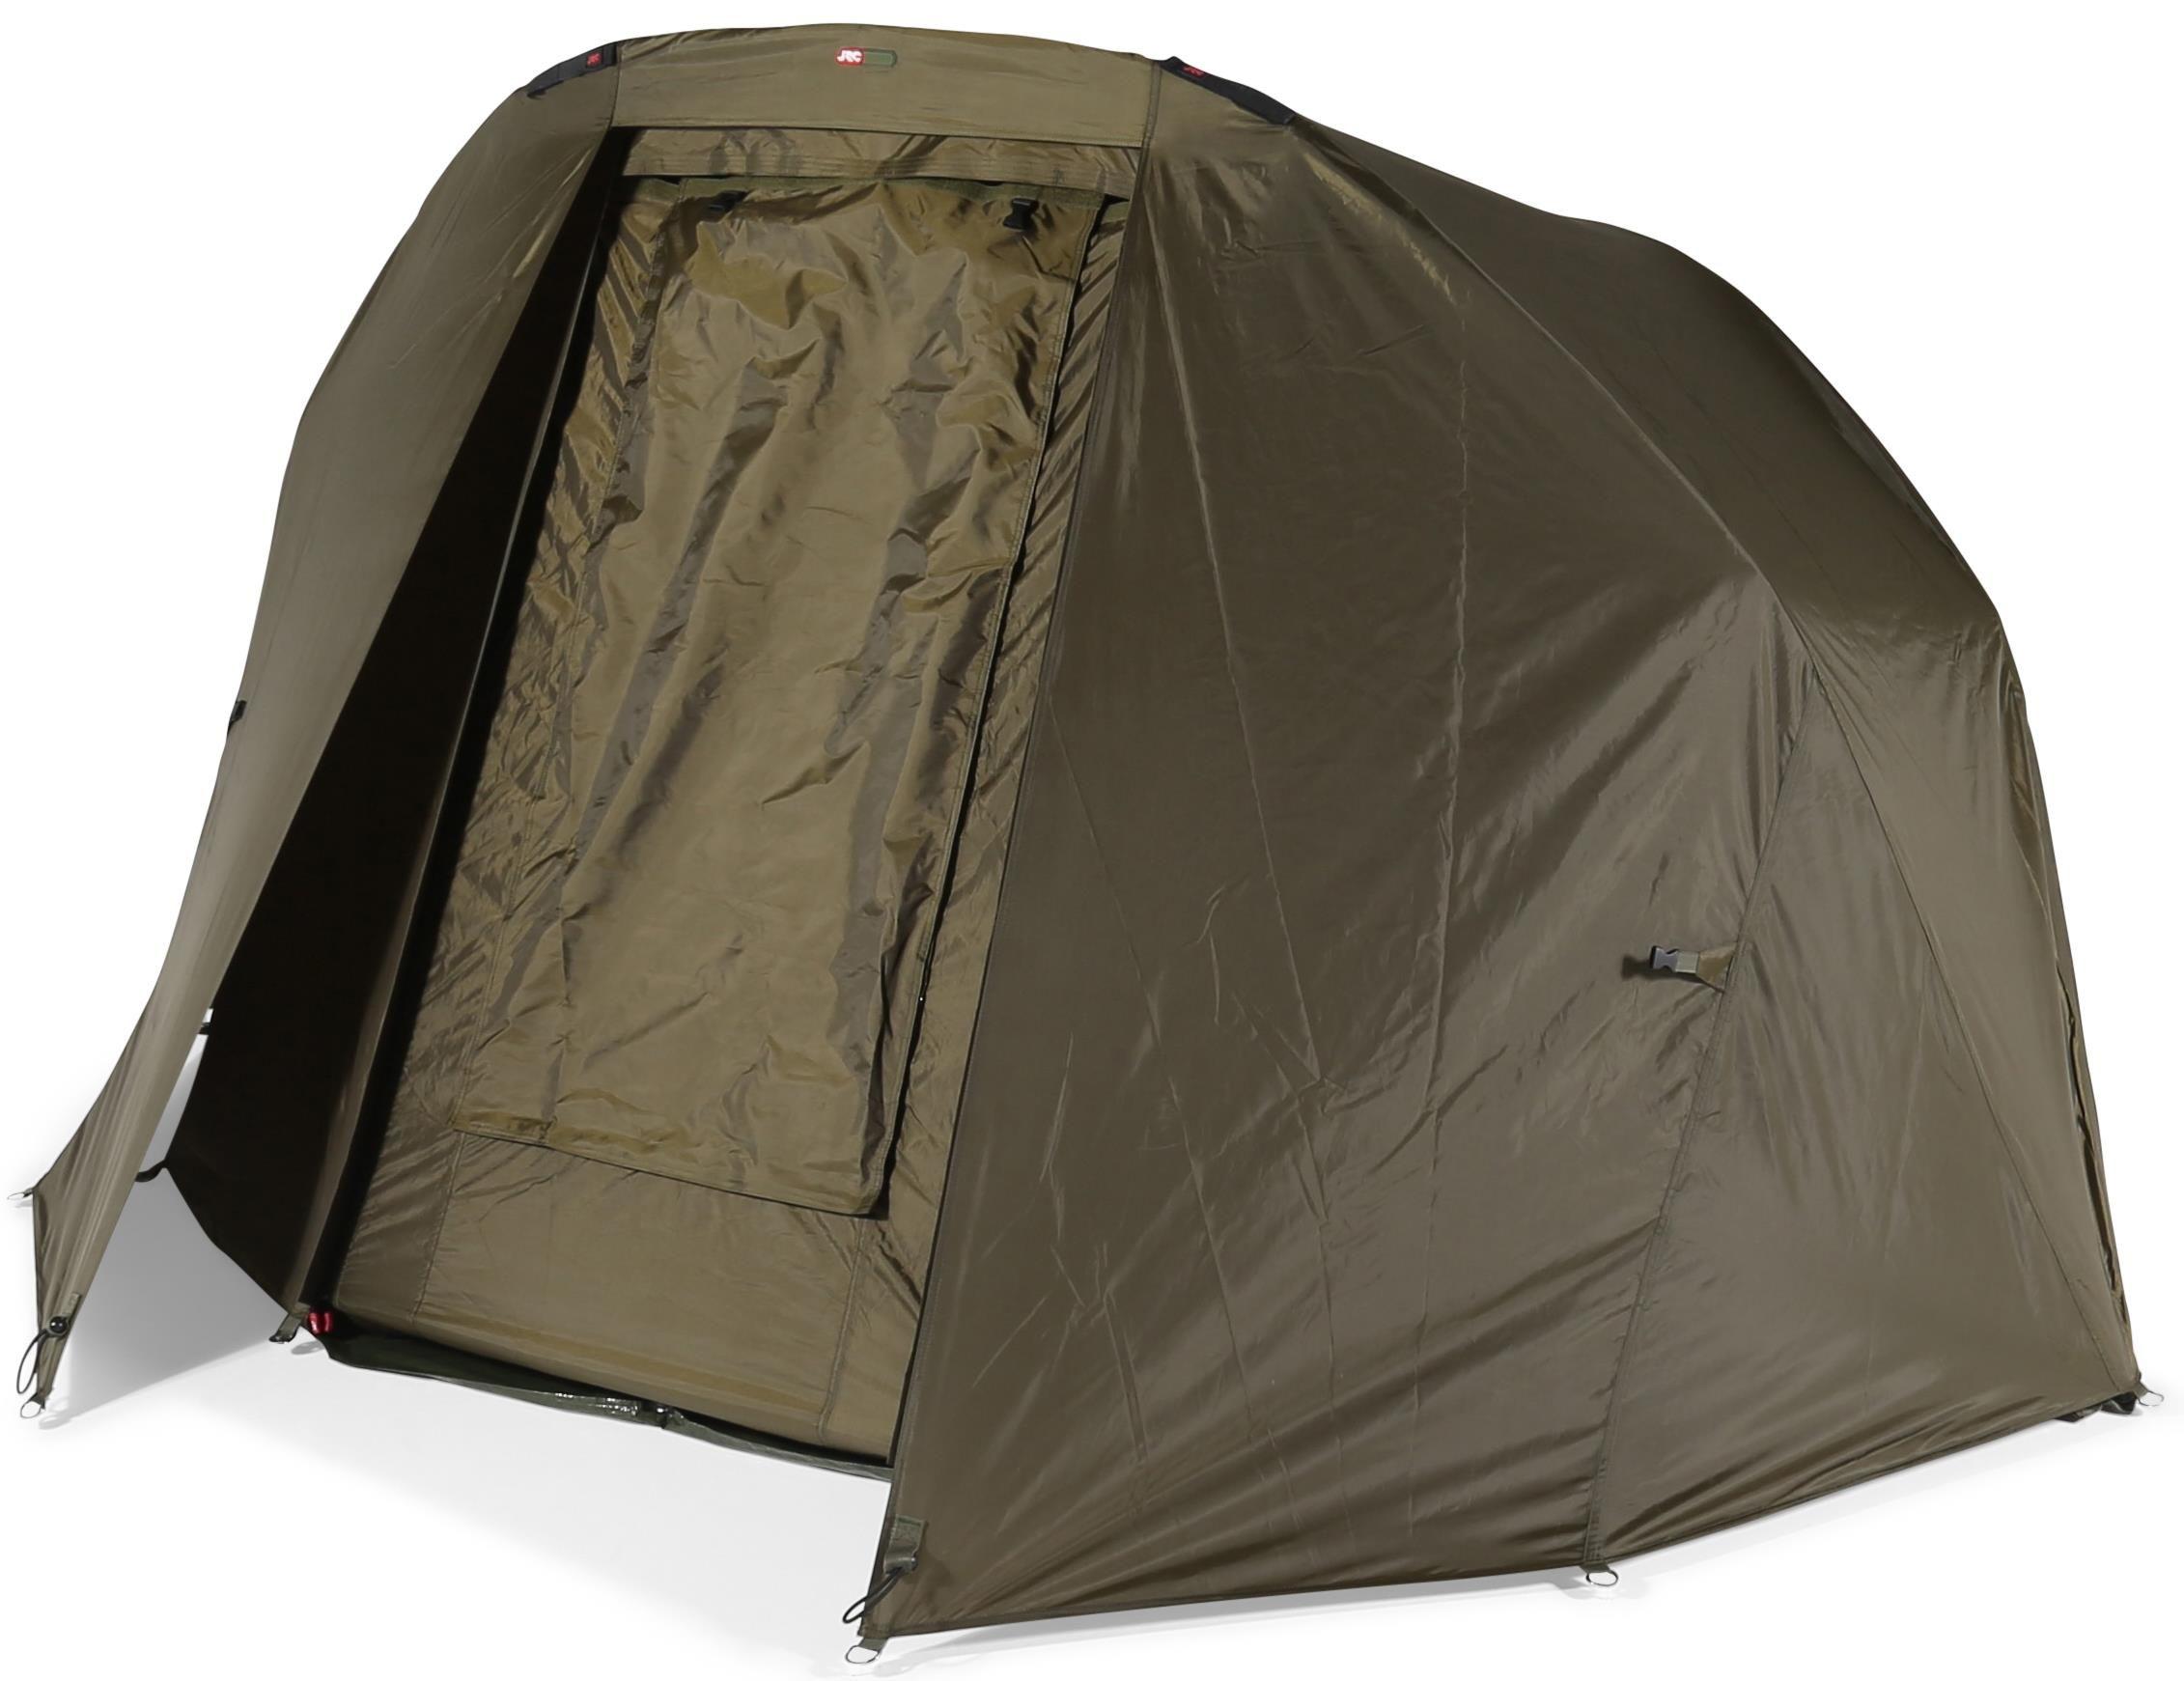 Namiot karpiowy JRC Defender Bivvy 1 osobowy